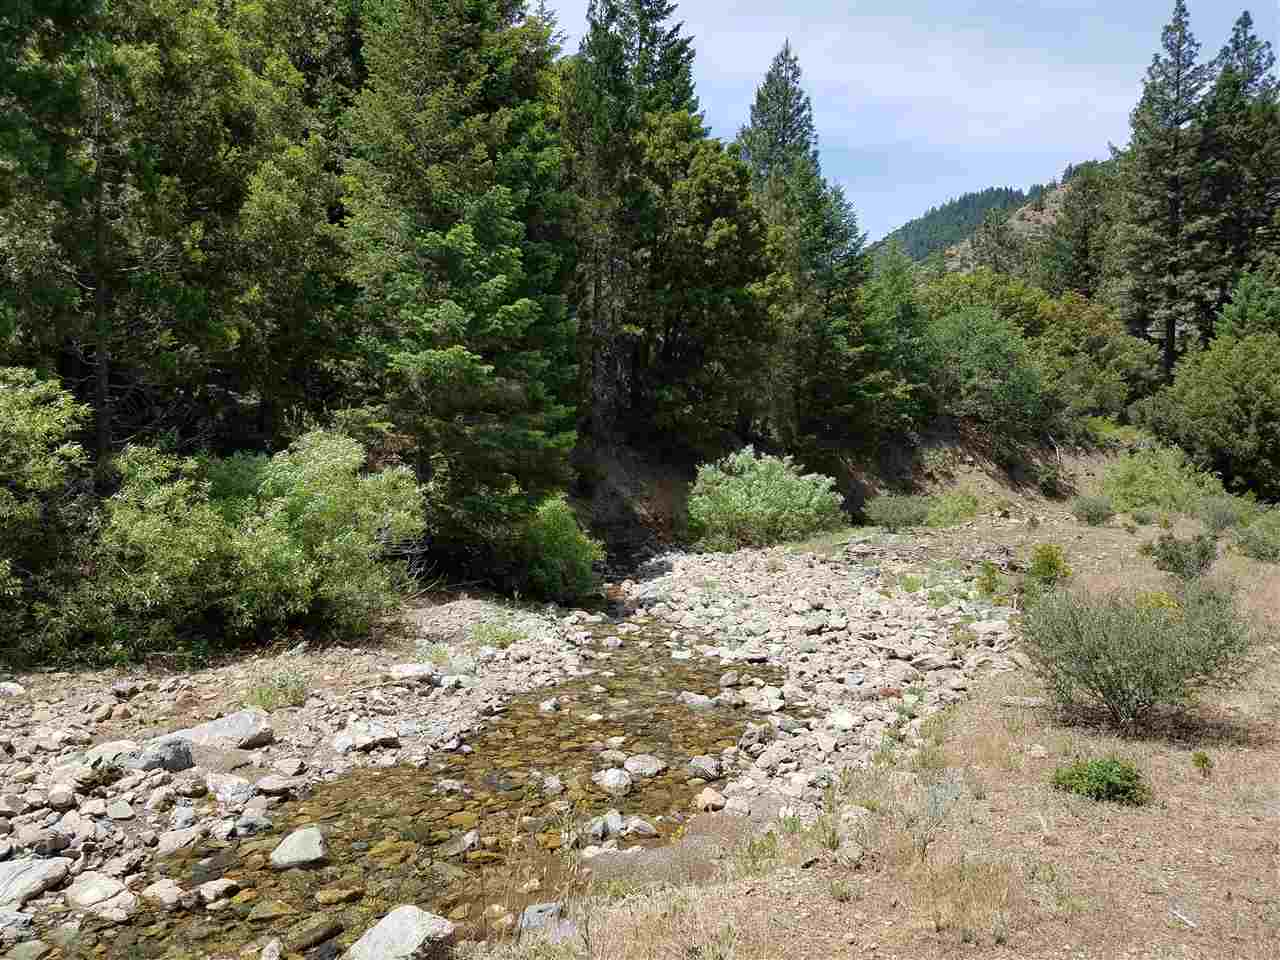 McAdams Creek Road Fort Jones, CA 96032